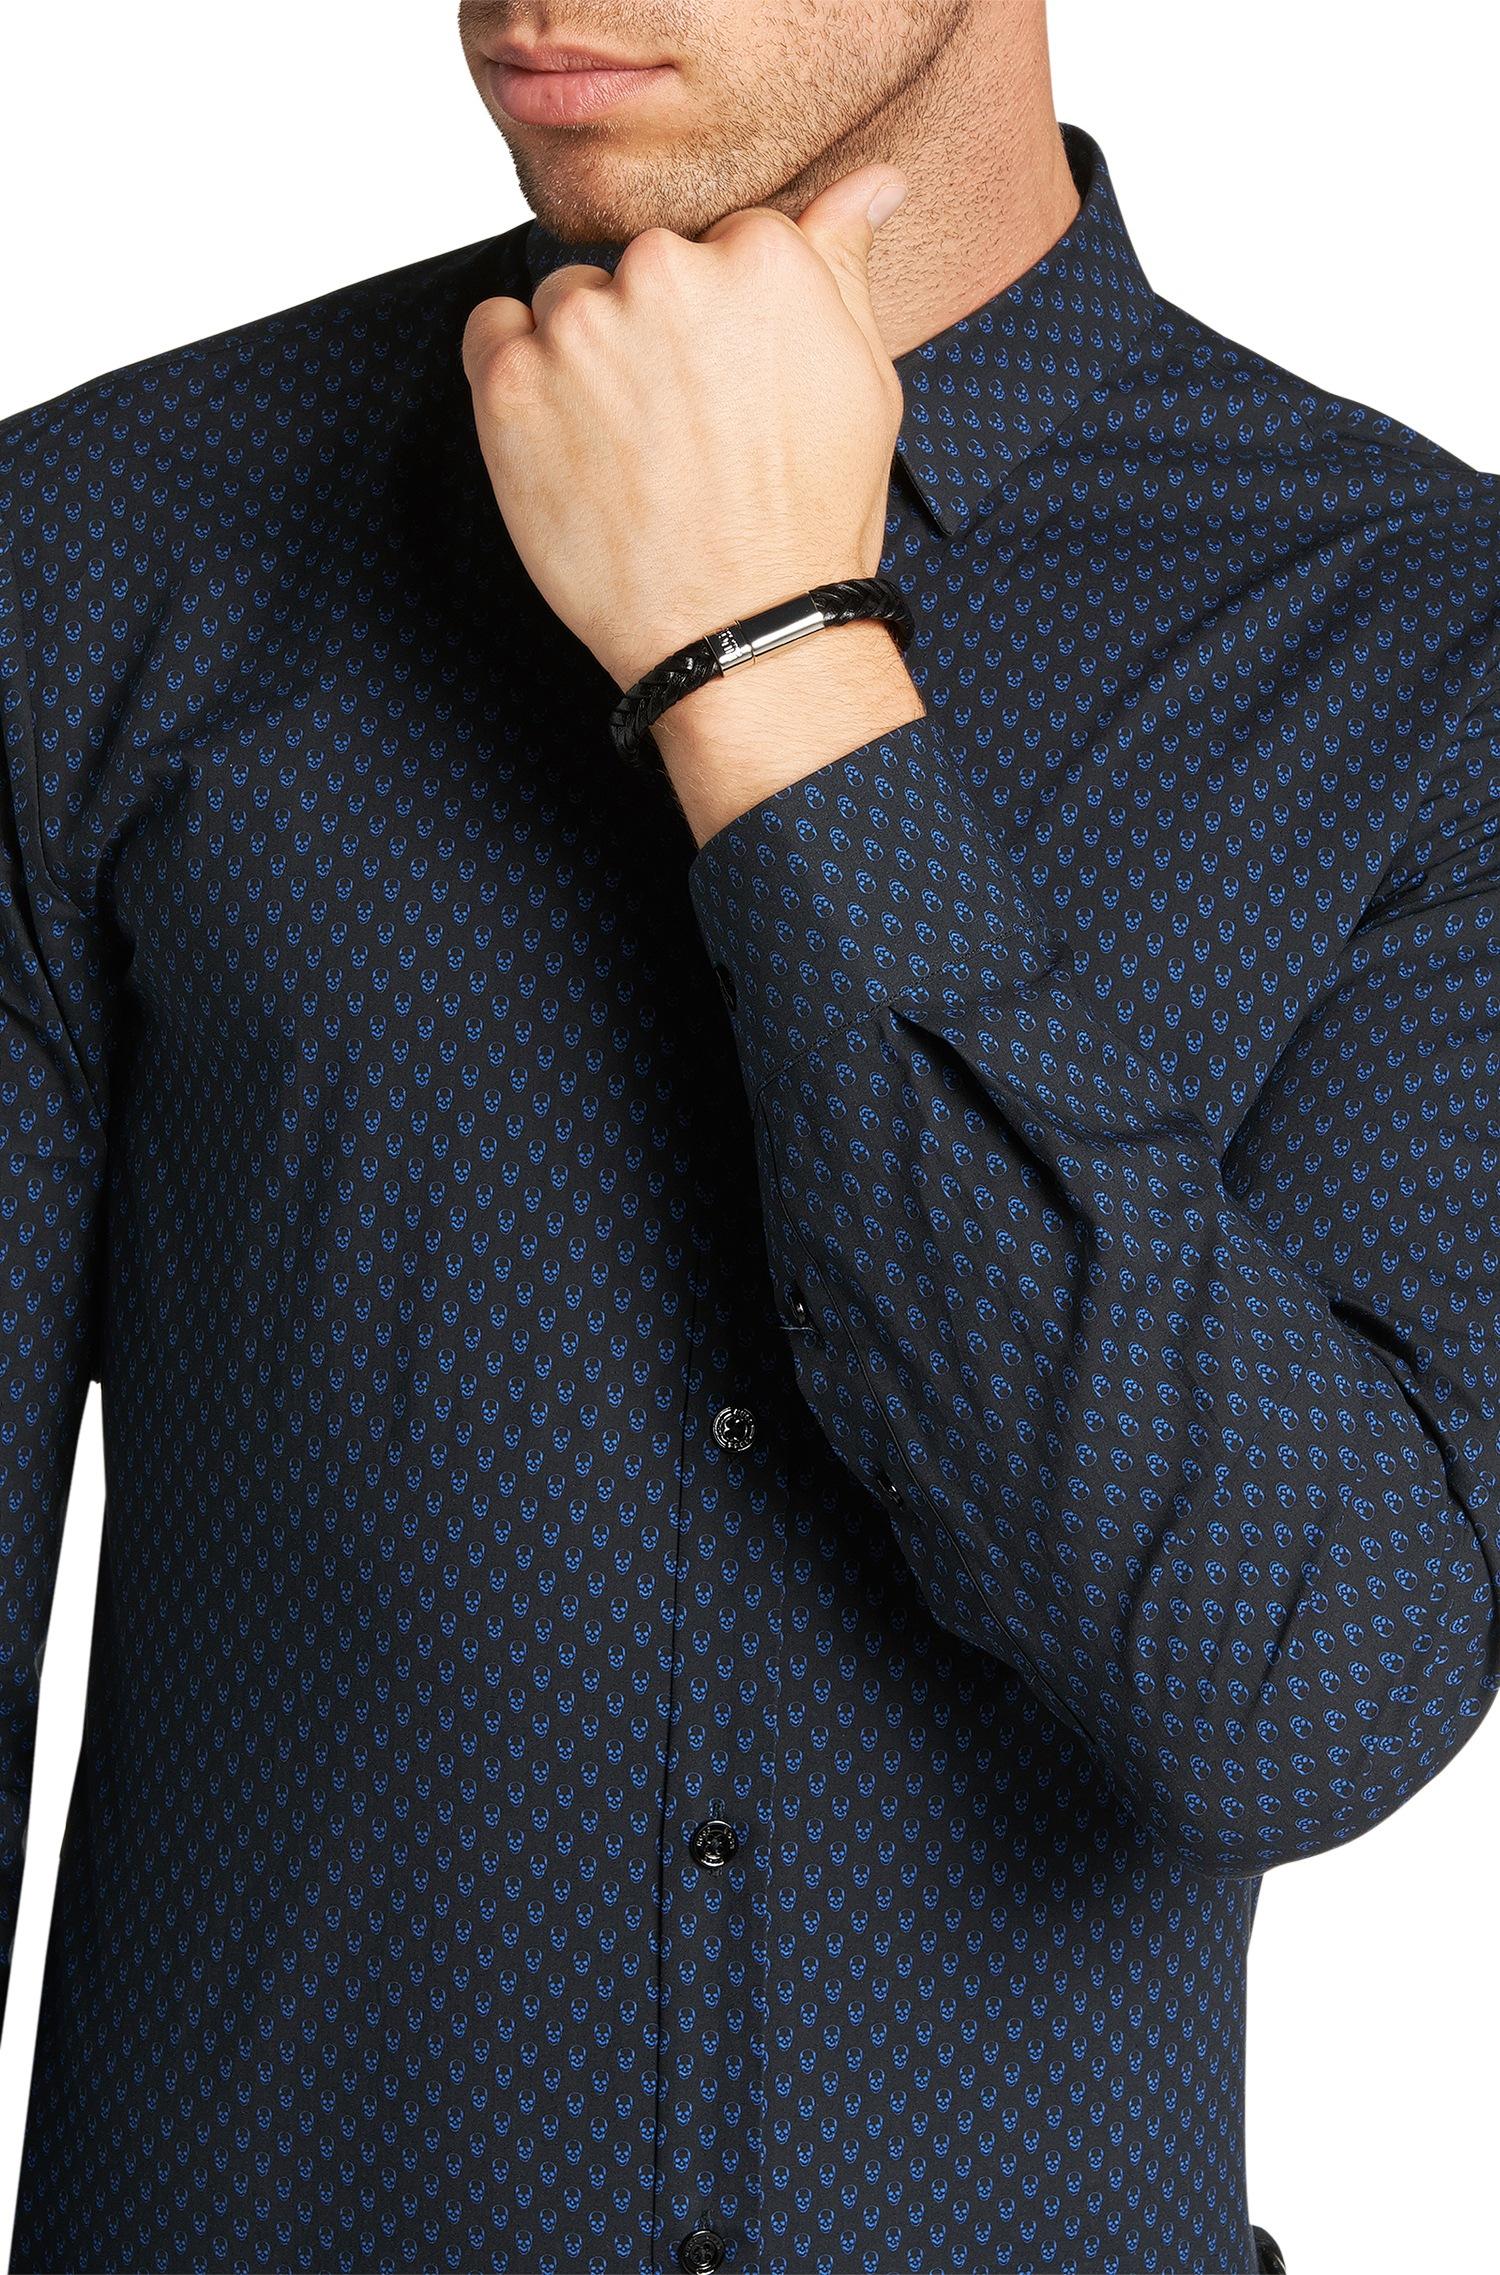 Venture mens black leather bracelet men bracelets links of london - Gallery